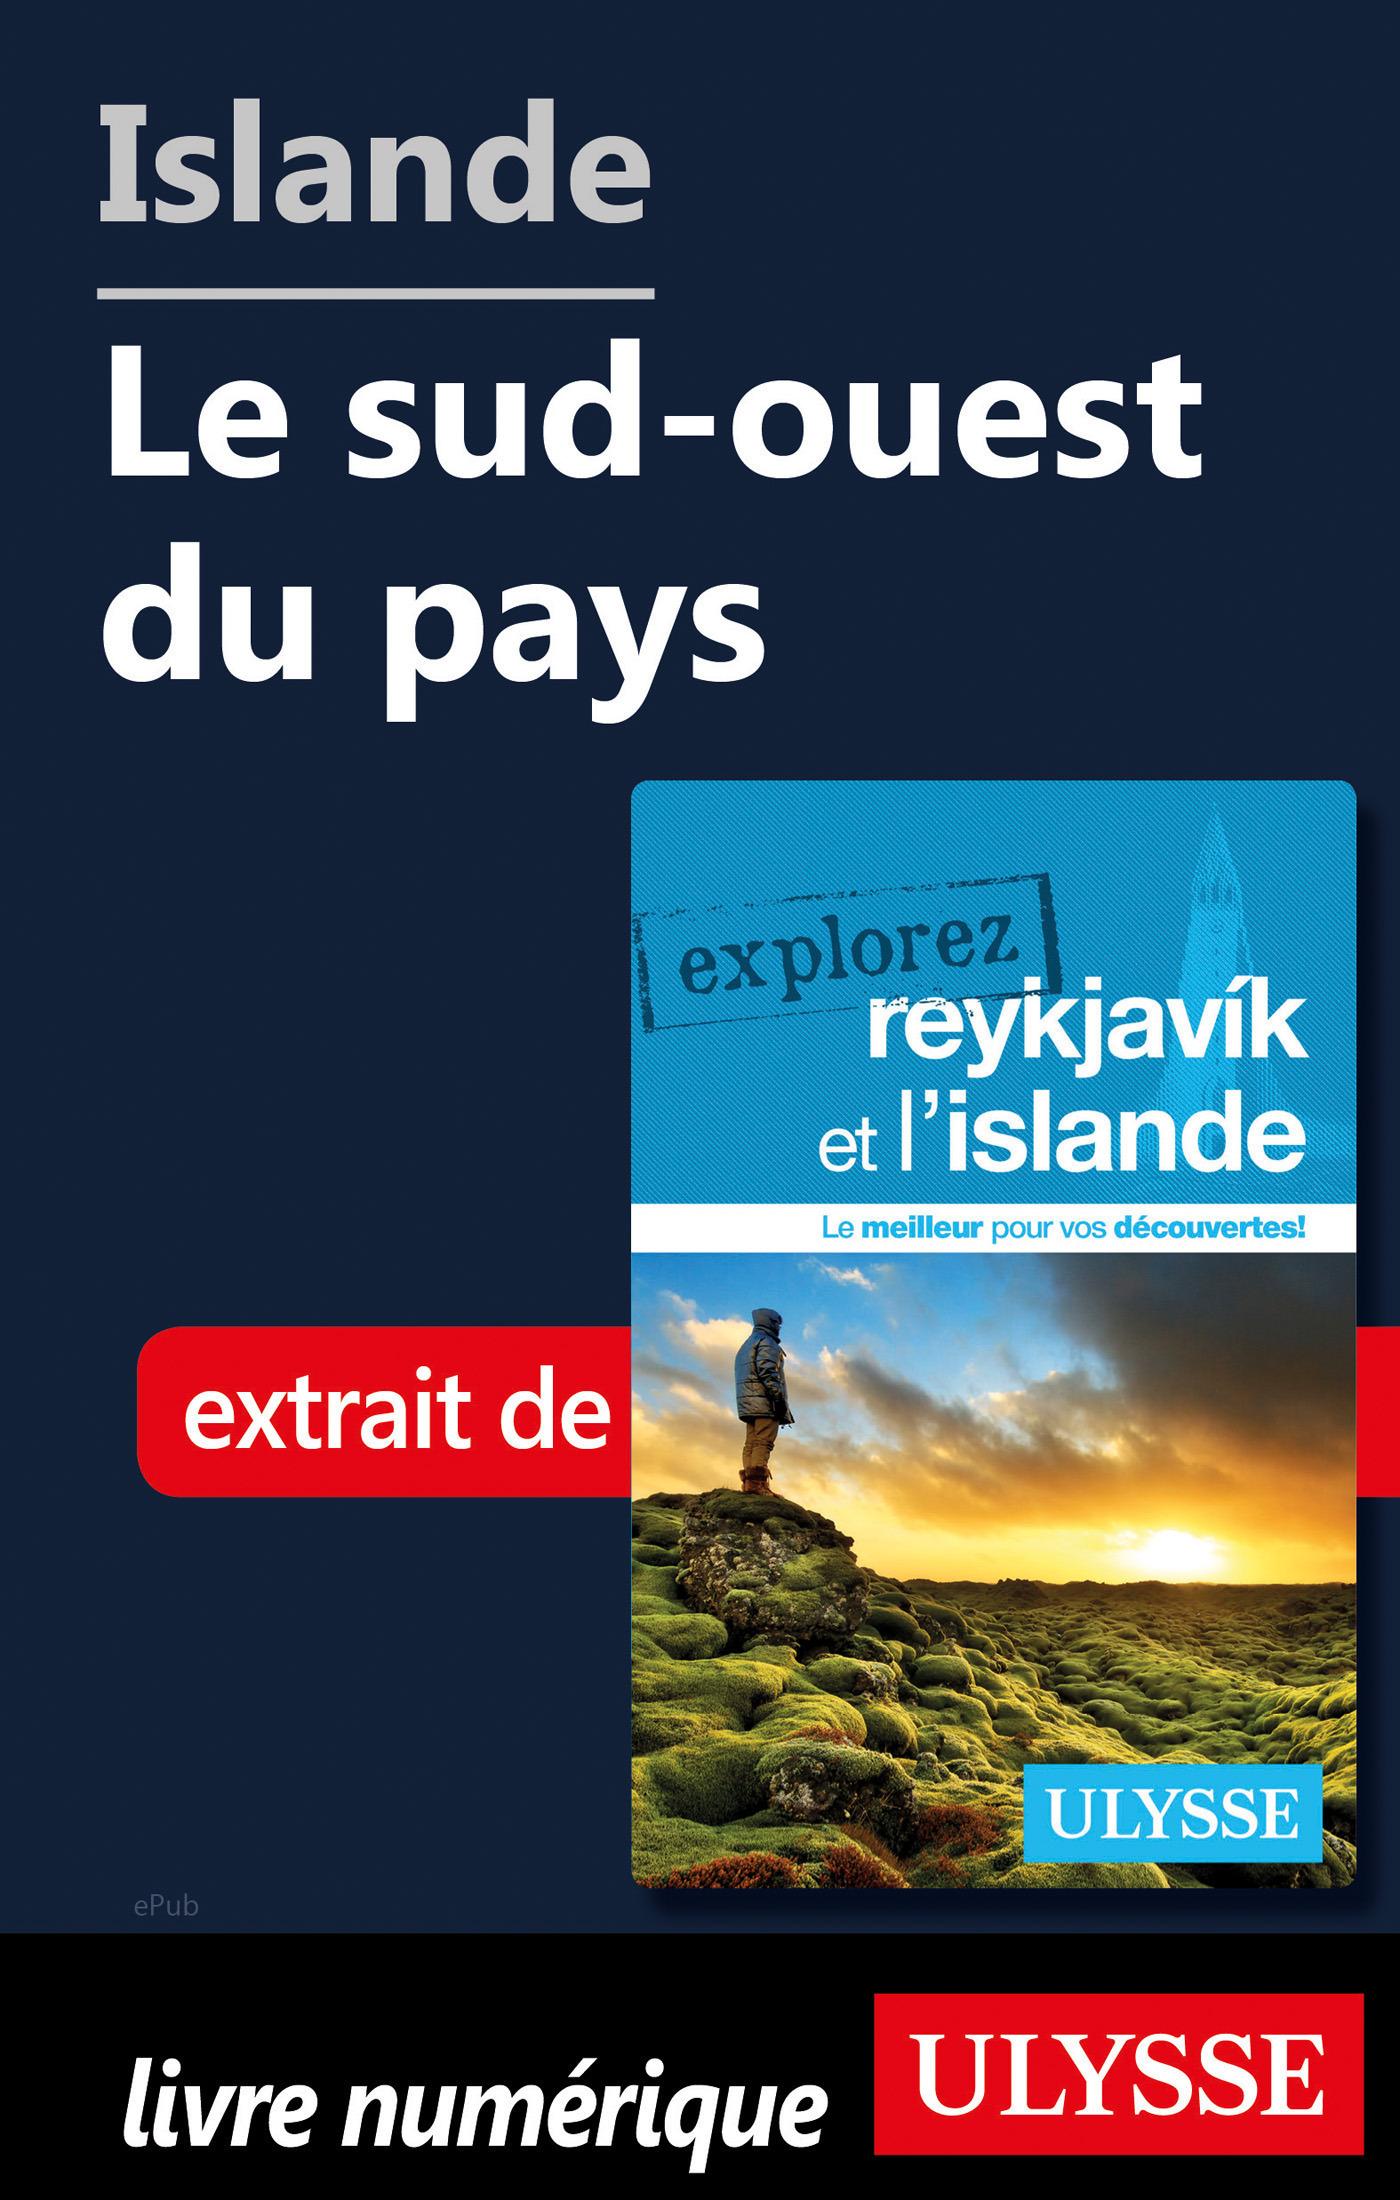 Islande - Le sud-ouest du pays (ebook)